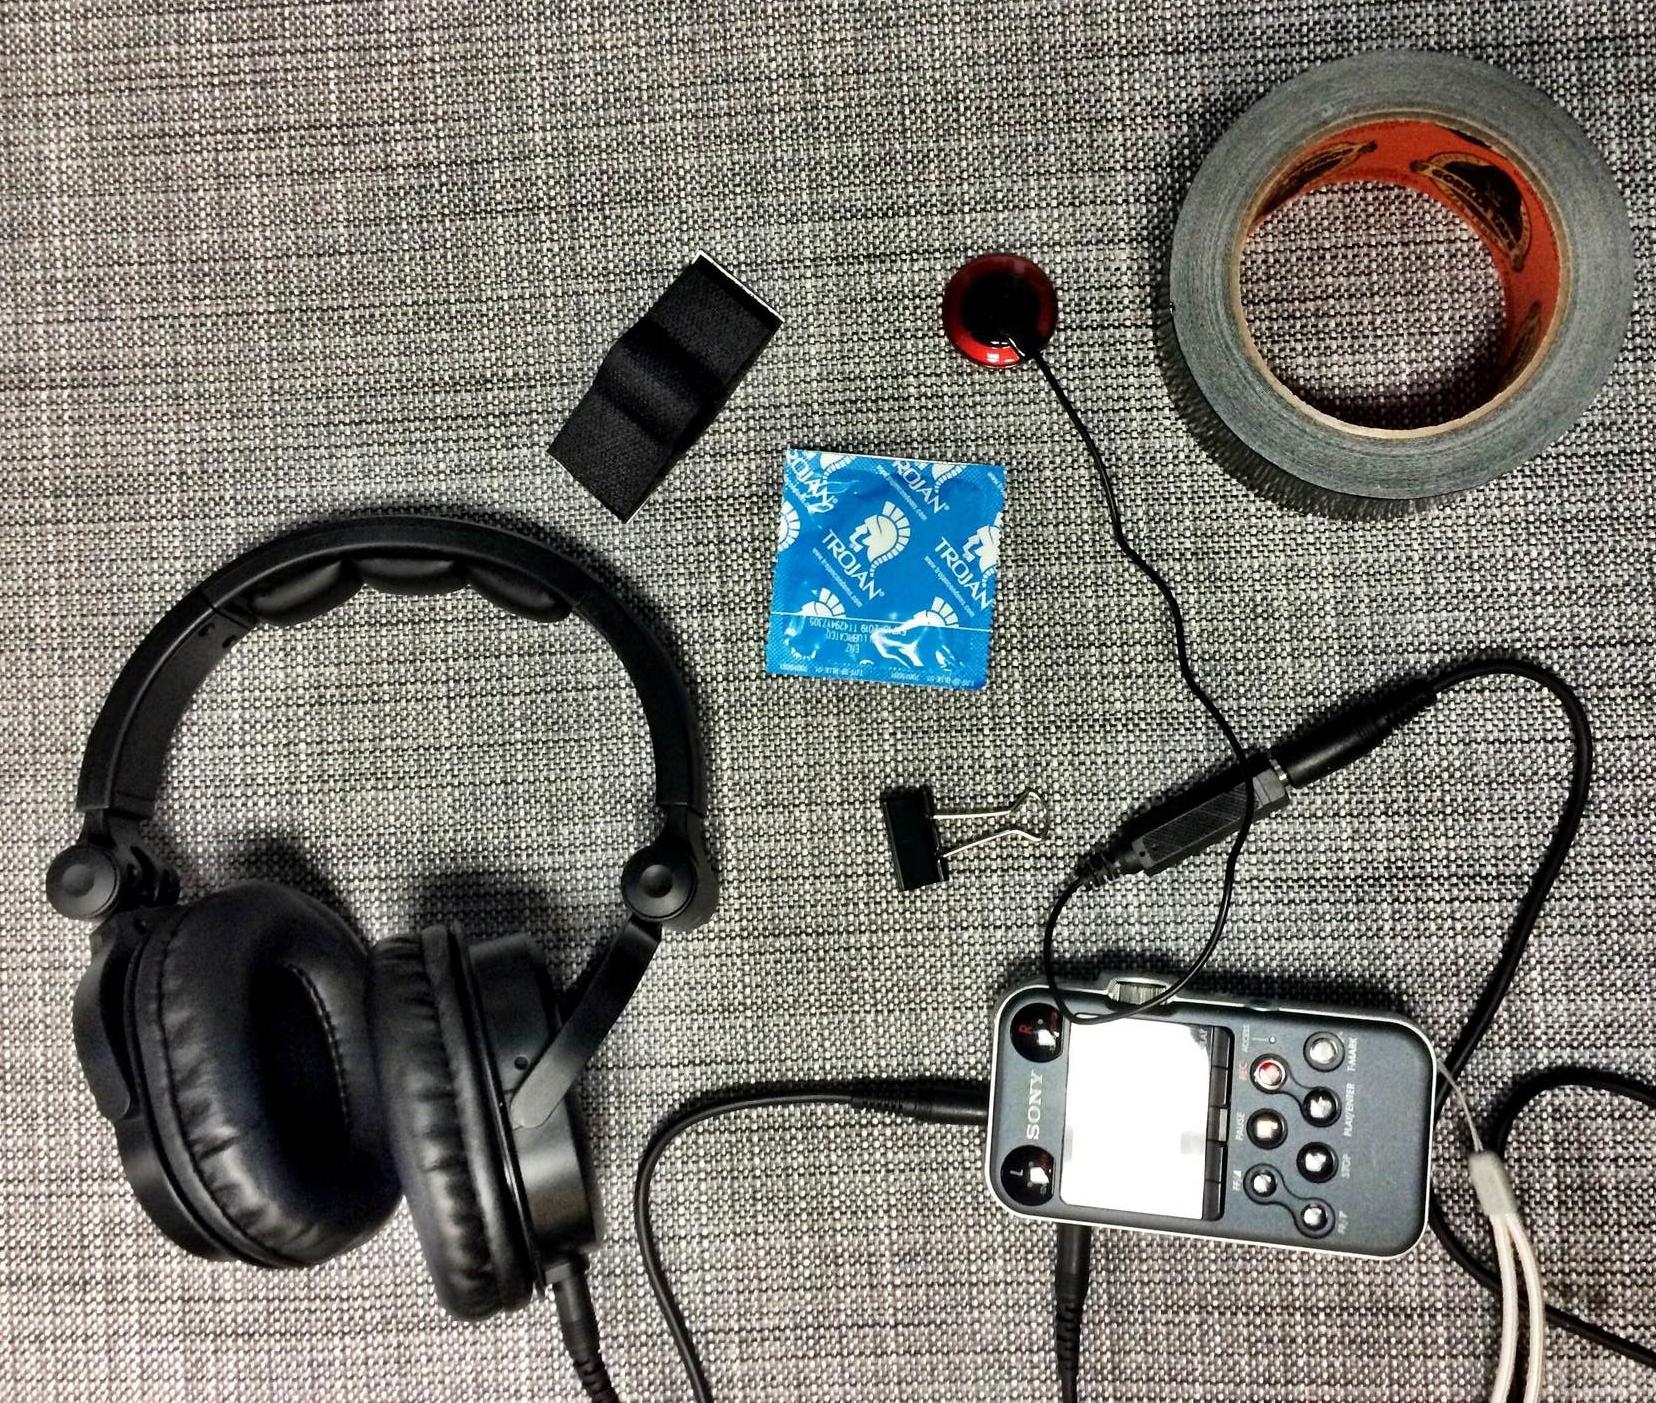 My underwater recording equipment.